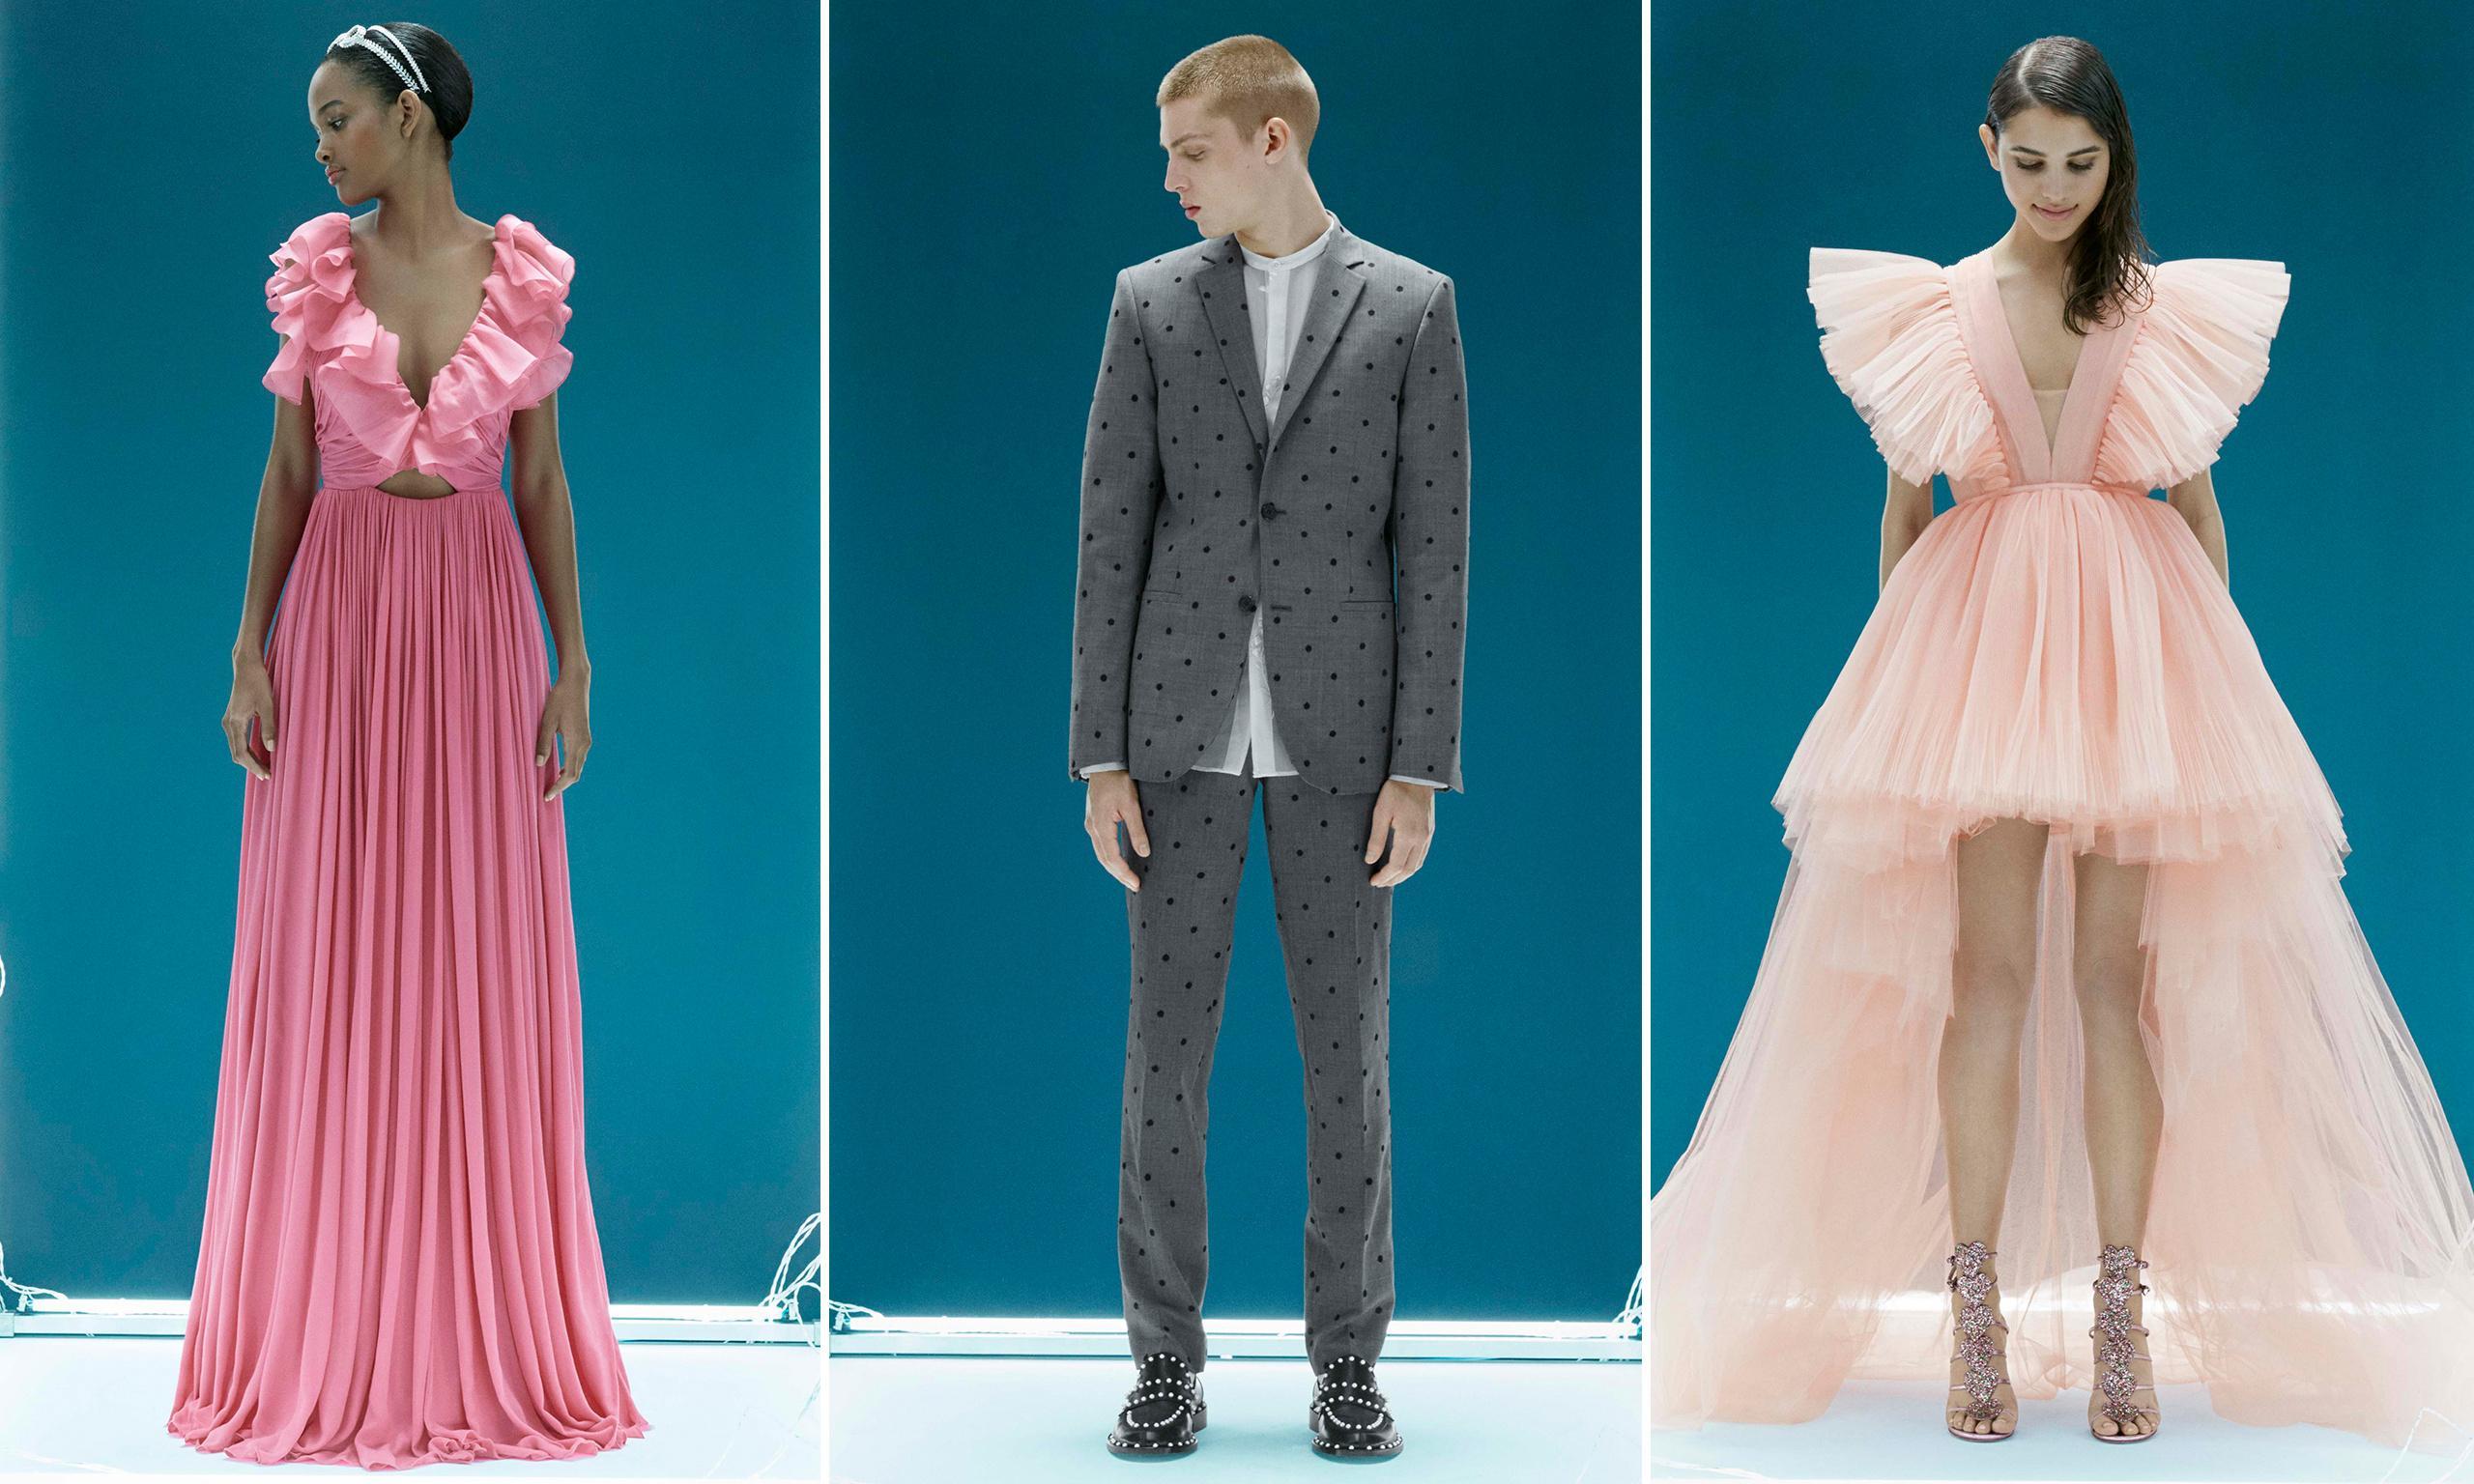 H&M announces collaboration with Italian designer Giambattista Valli